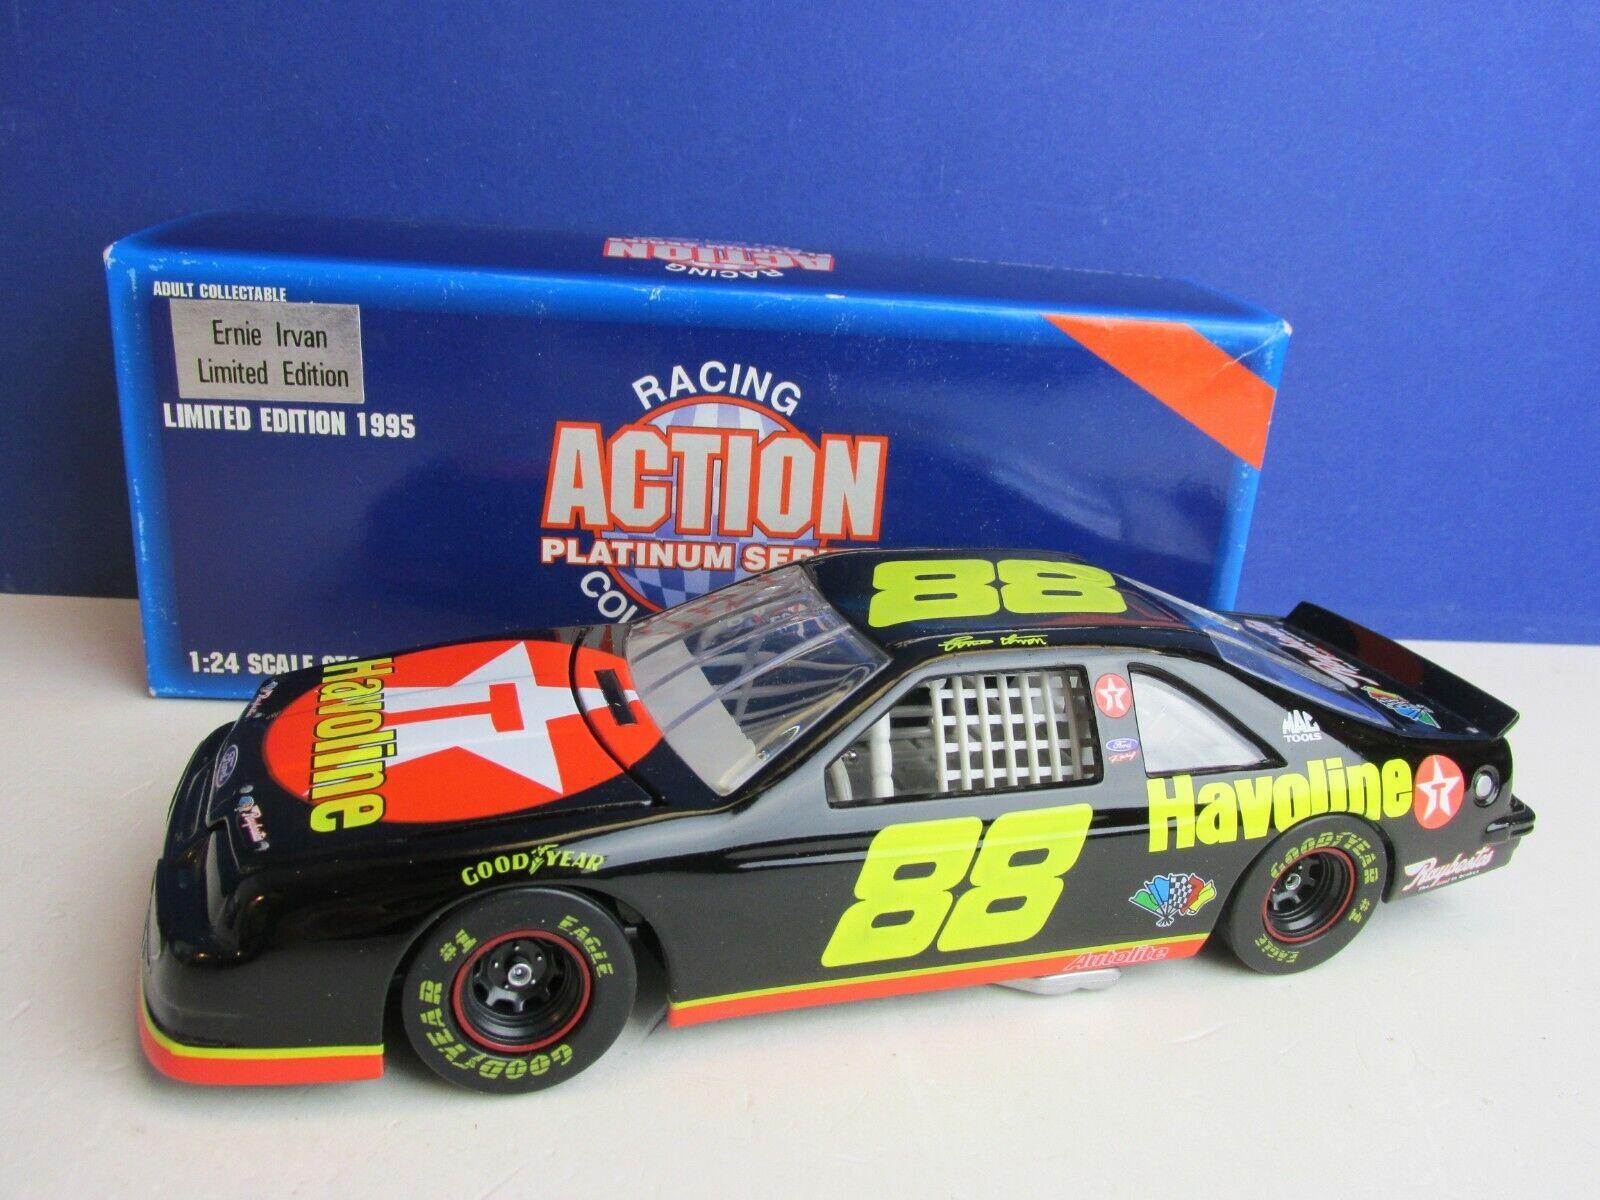 RACING ACTION PLATINUM SERIES ernie irvan 88 NASCAR MODEL CAR DIECAST 1 24 05i